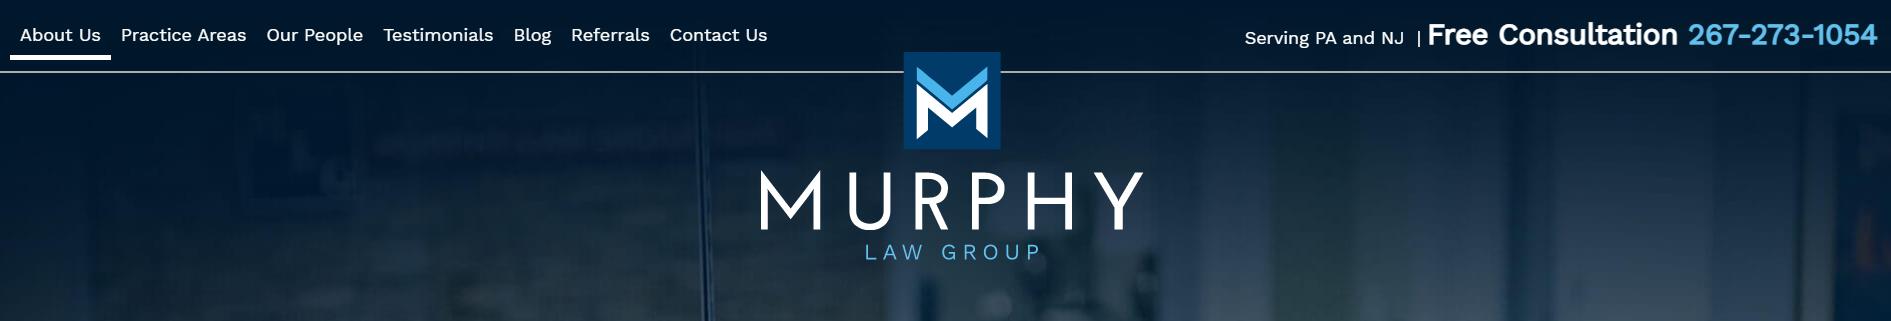 Murphy Law Group